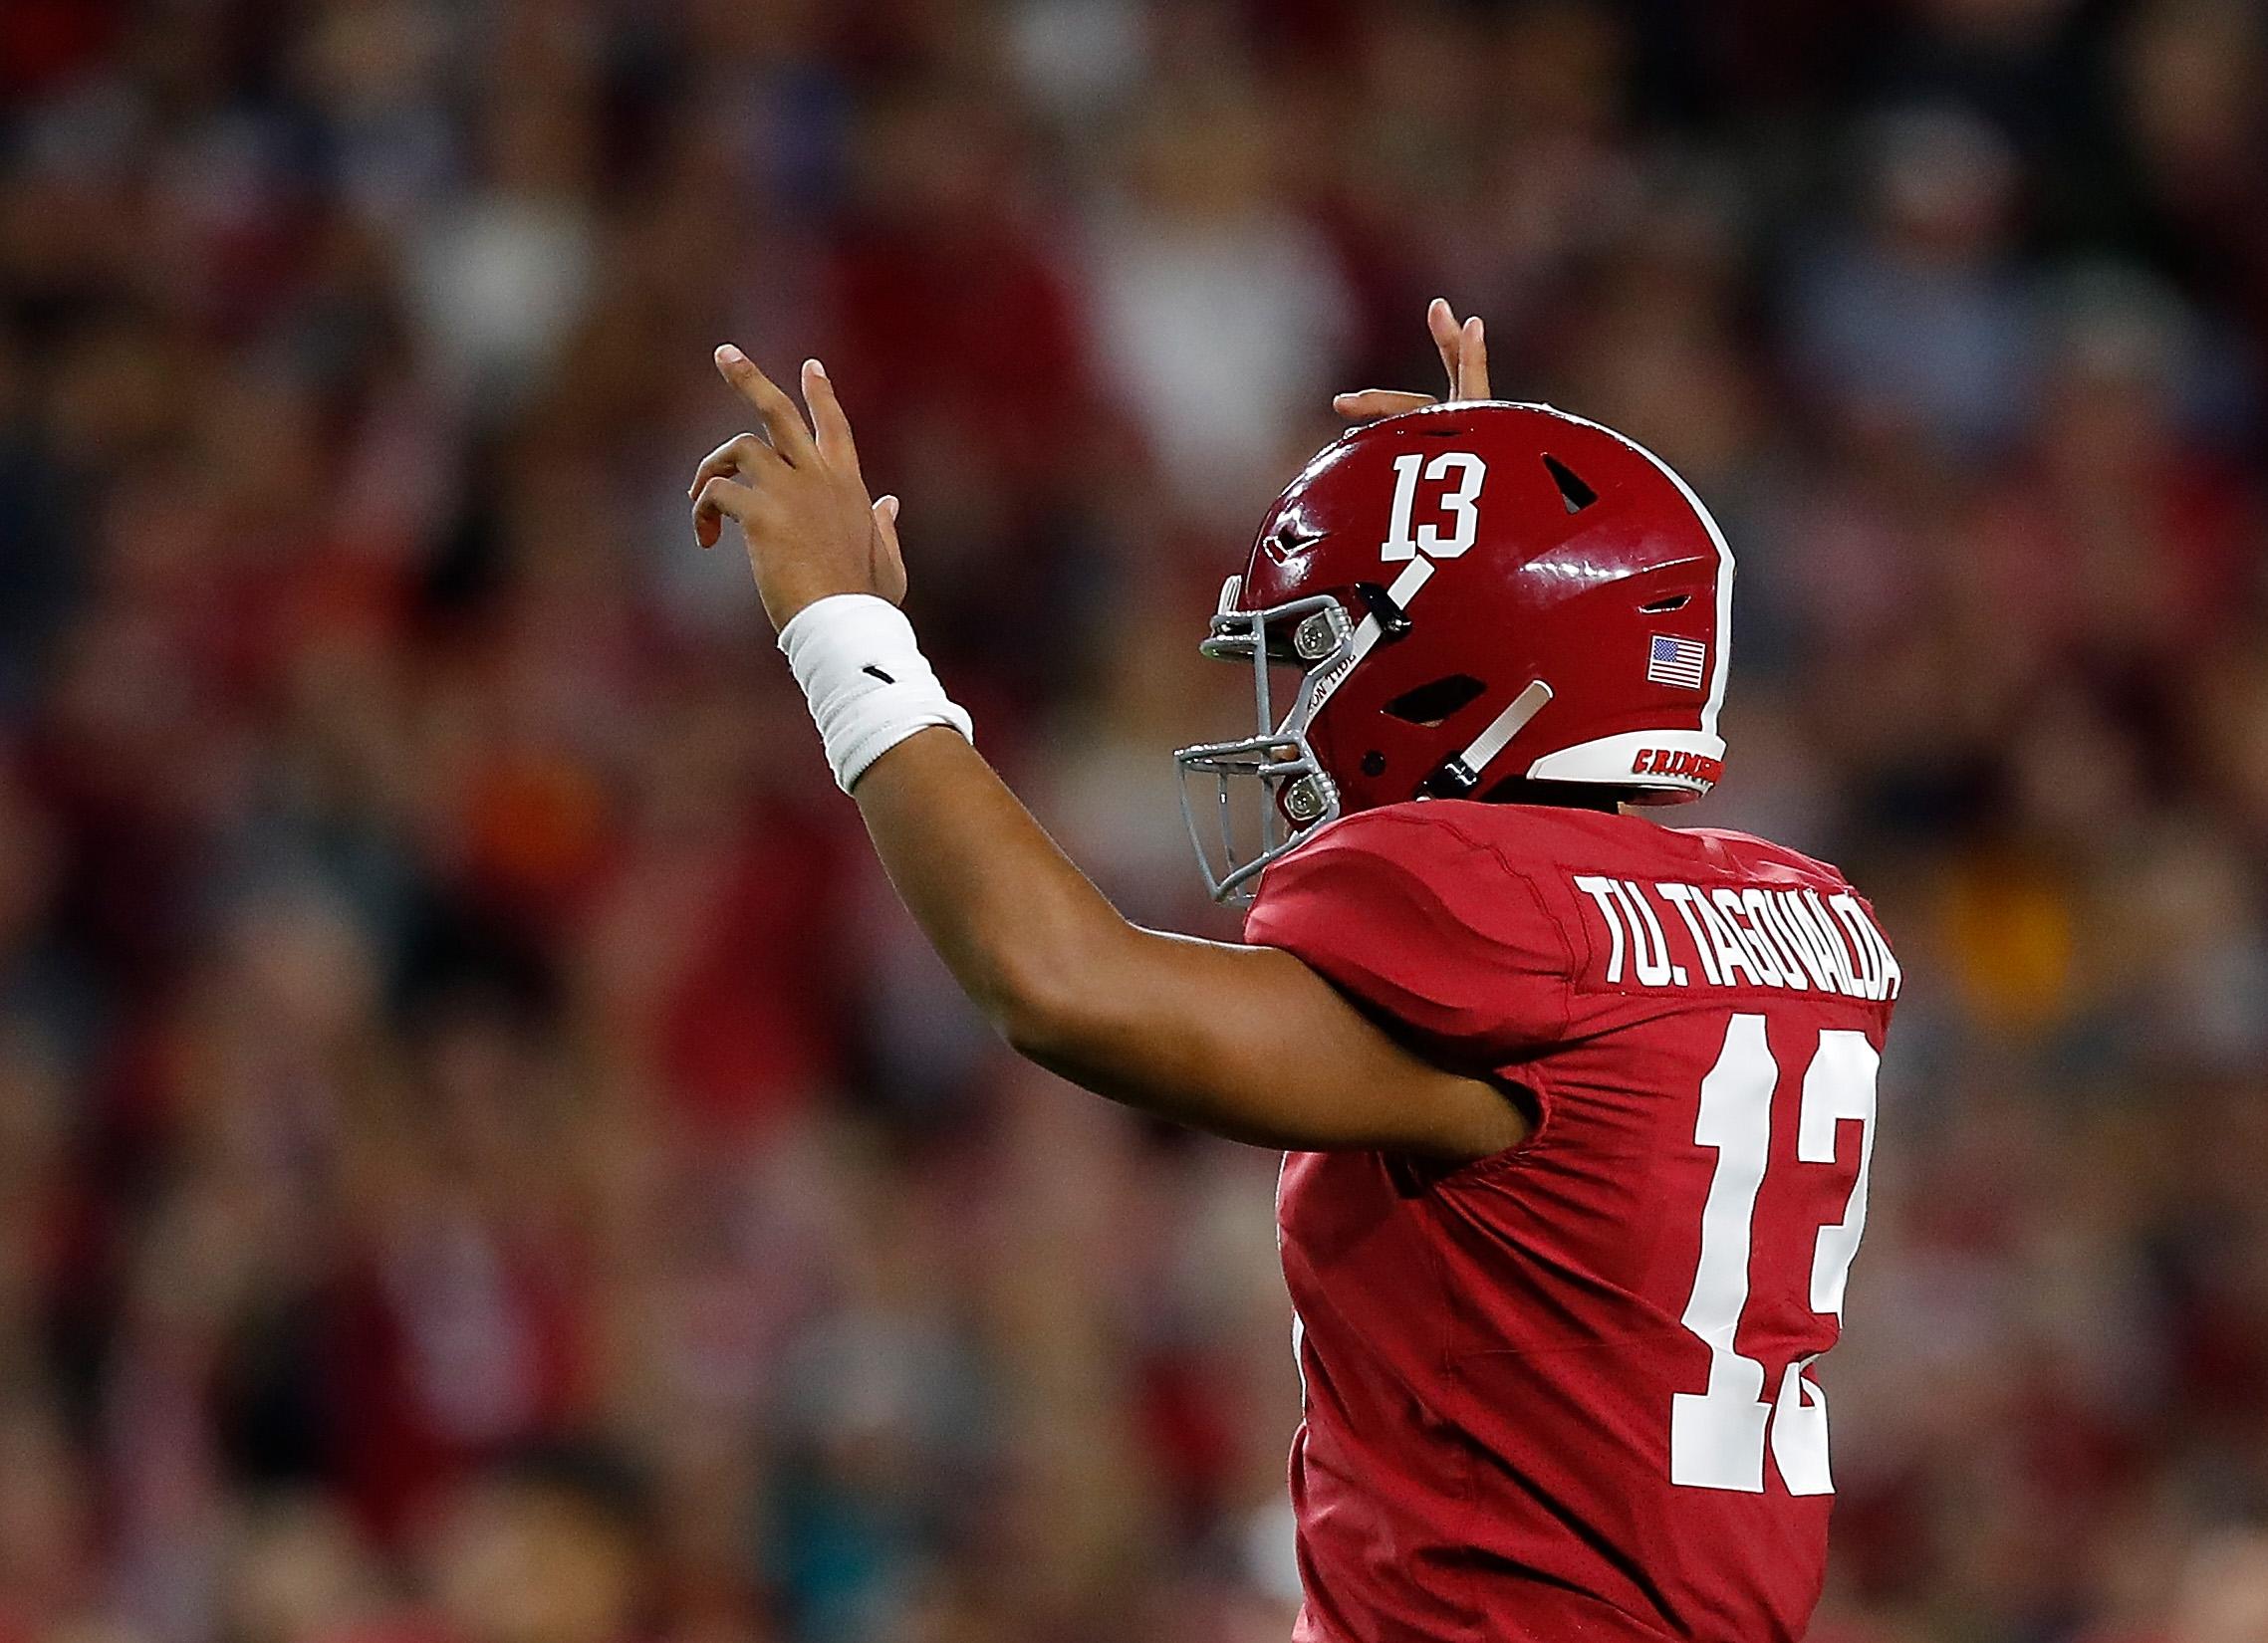 Lsu Vs Alabama Will Loser Still Make The College Football